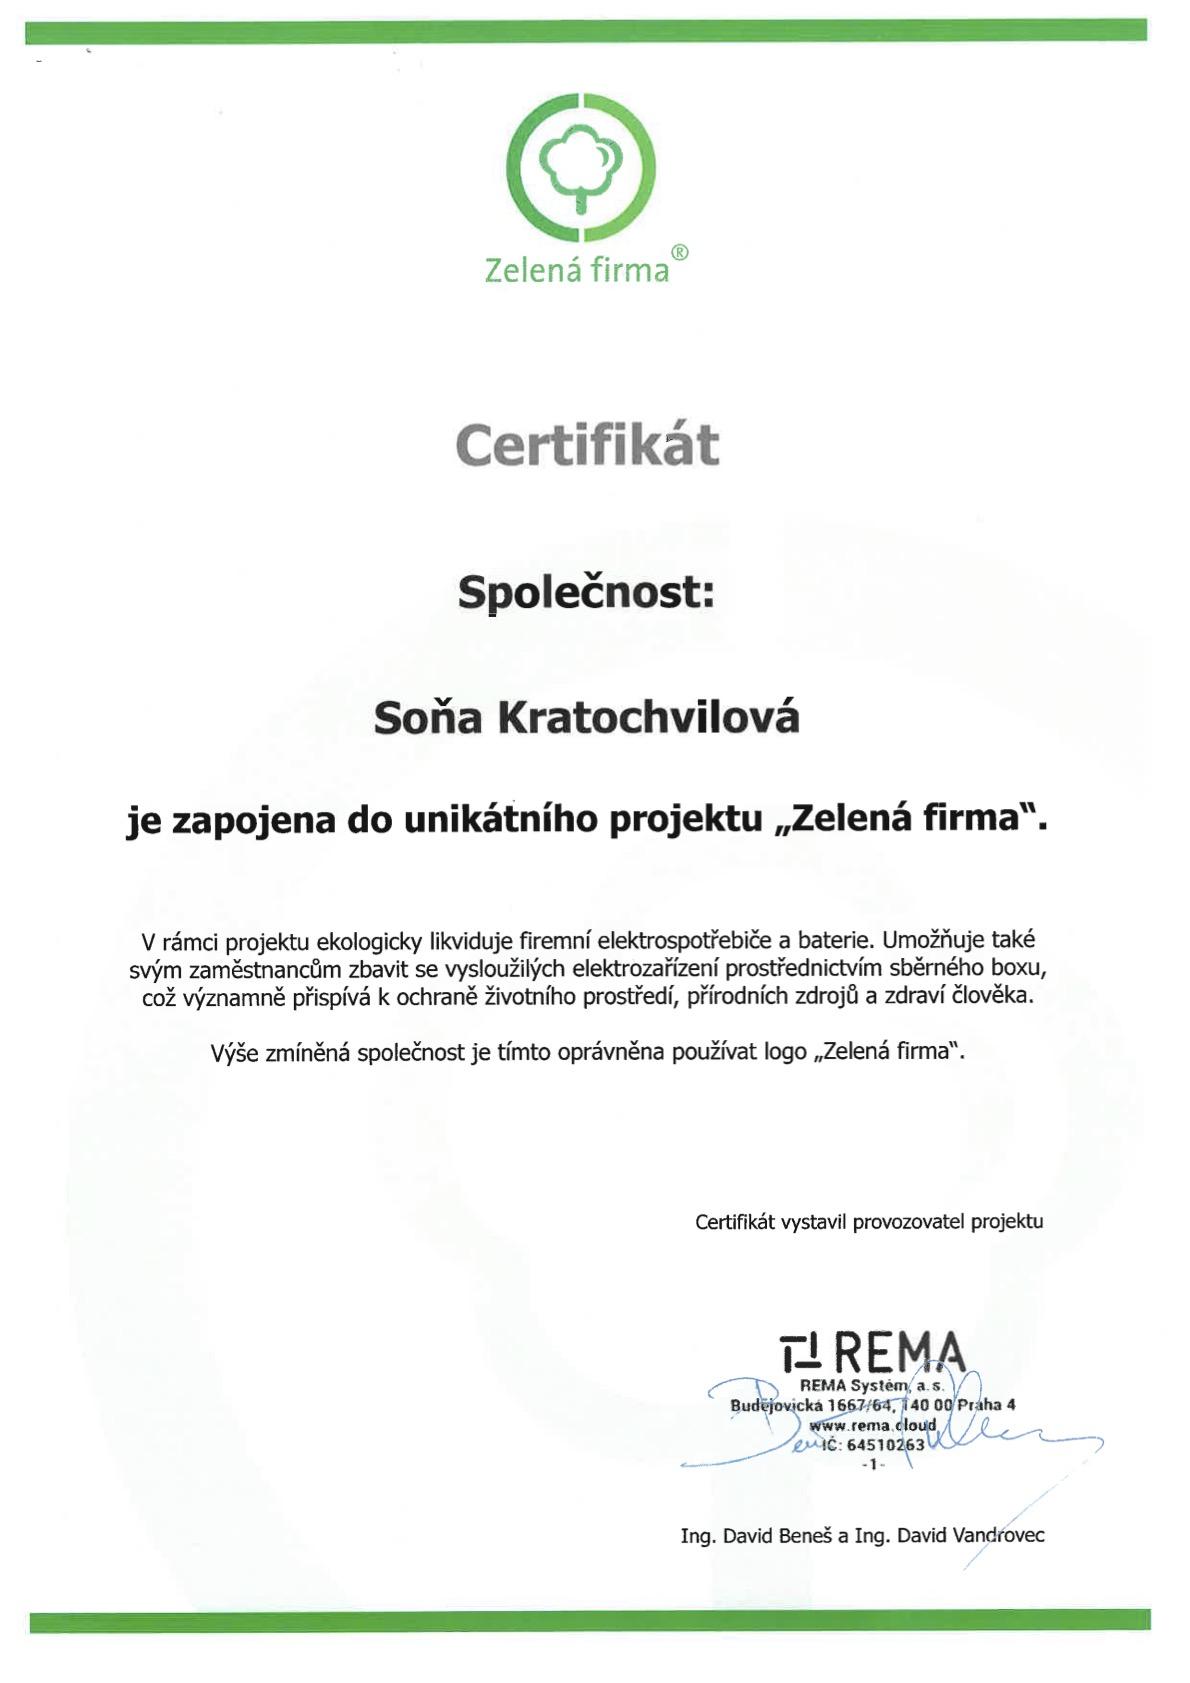 Applegang_zelená_firma